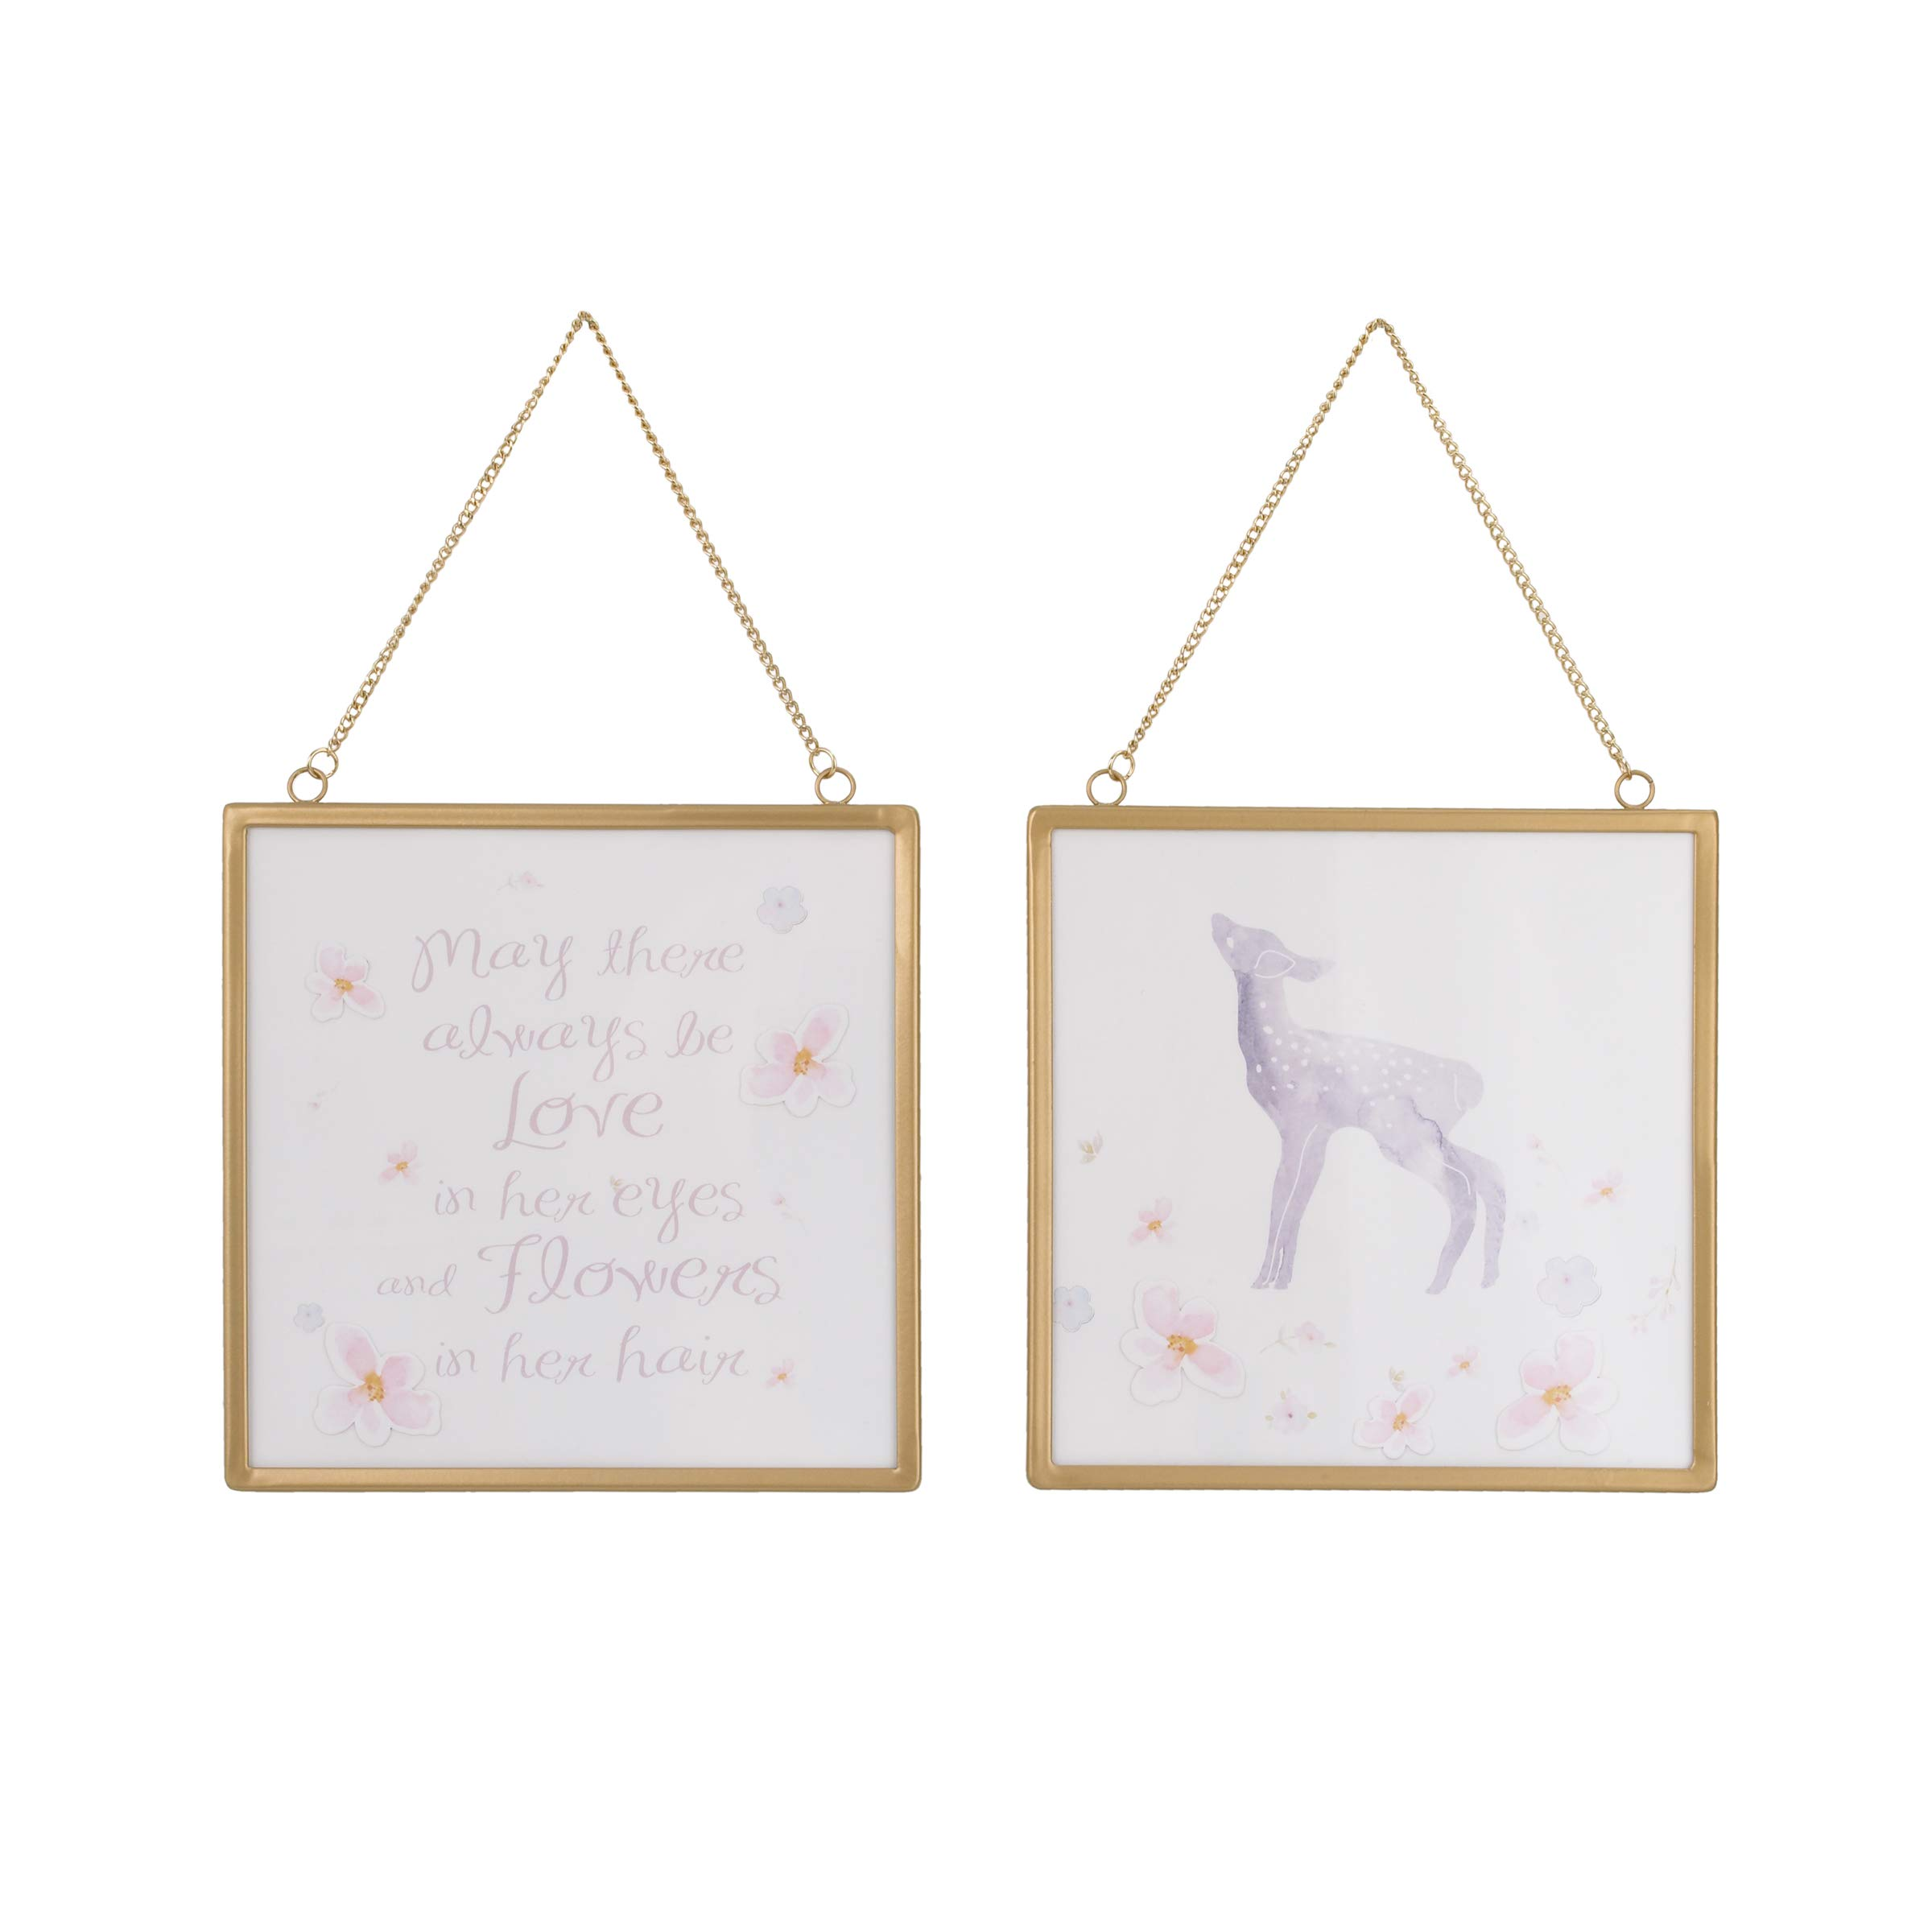 NoJo Watercolor Deer 2 Piece Framed Nursery Wall Art with Deer, Flowers & Positive Message, Gold Pink/Grey/White, 8'' x 8''